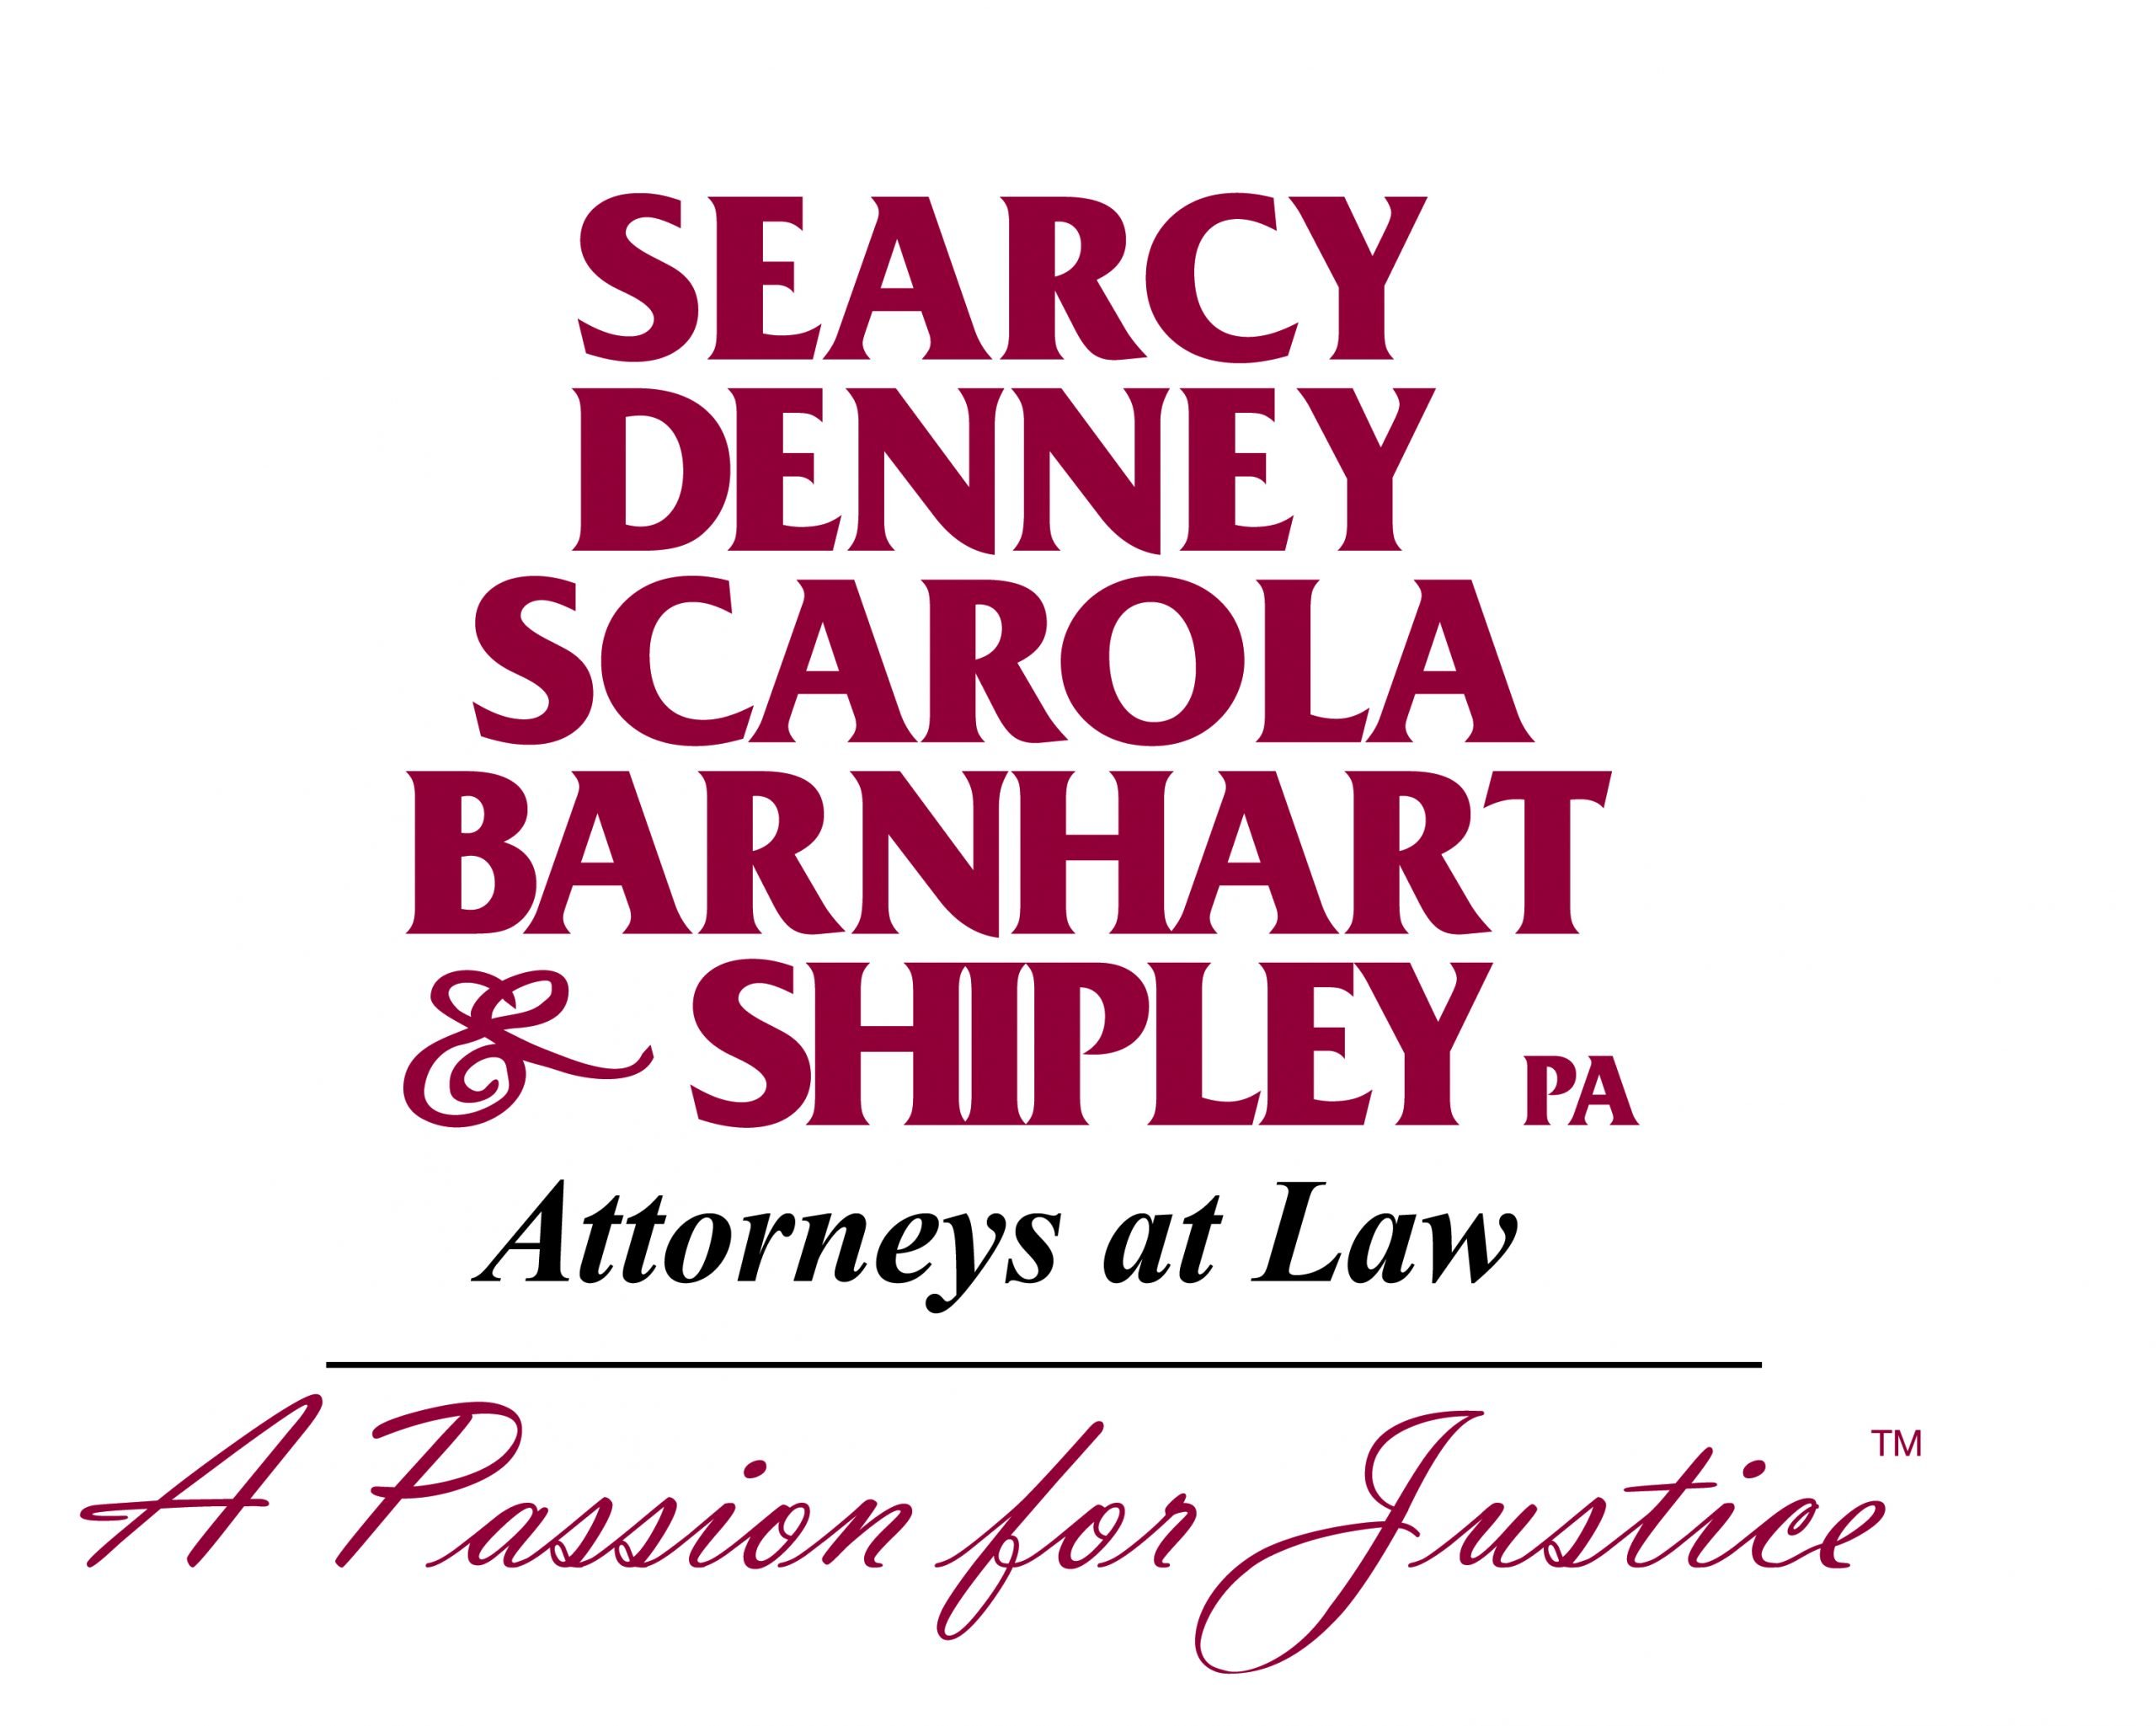 Searcy Denney Scarola Barnhart & Shipley, PA